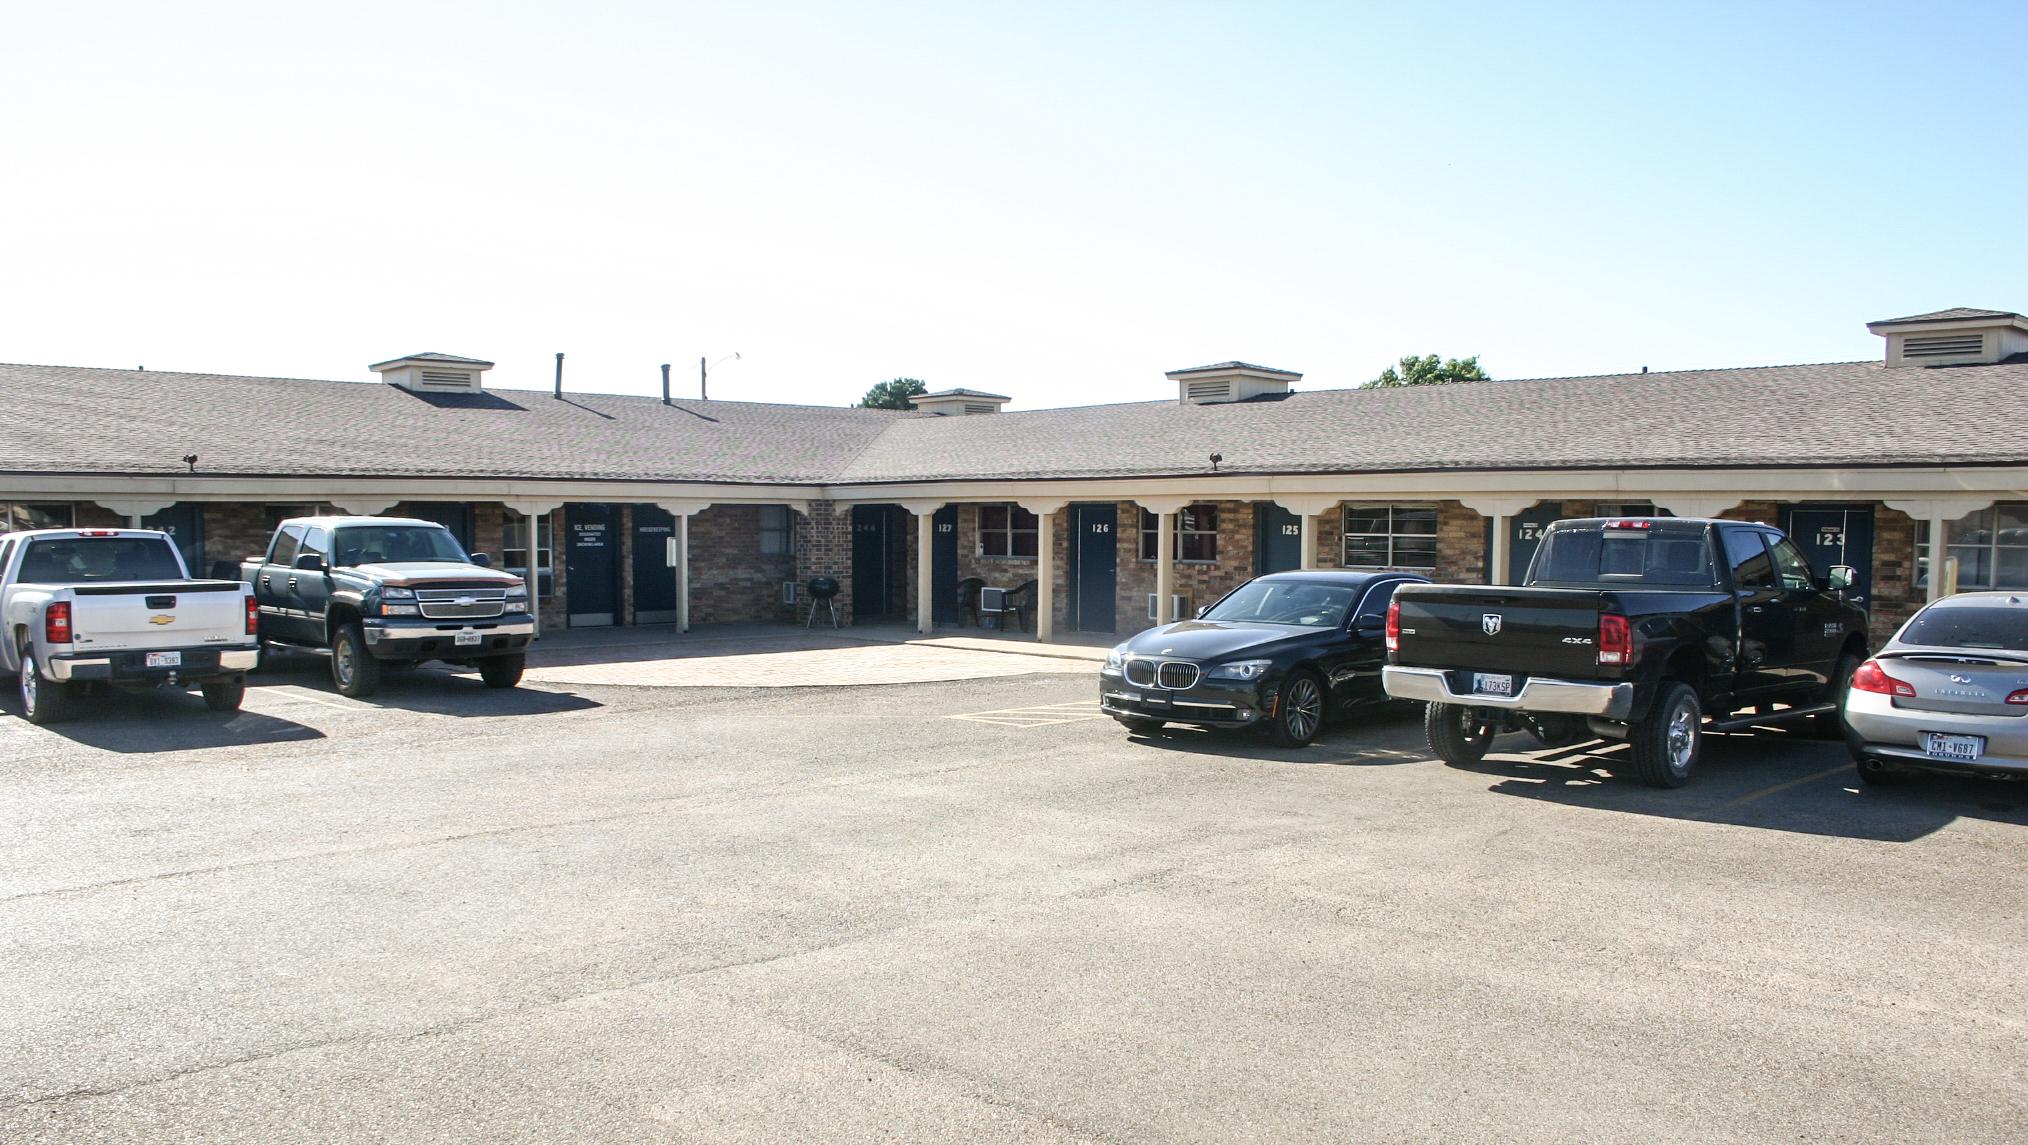 Motel parking lot